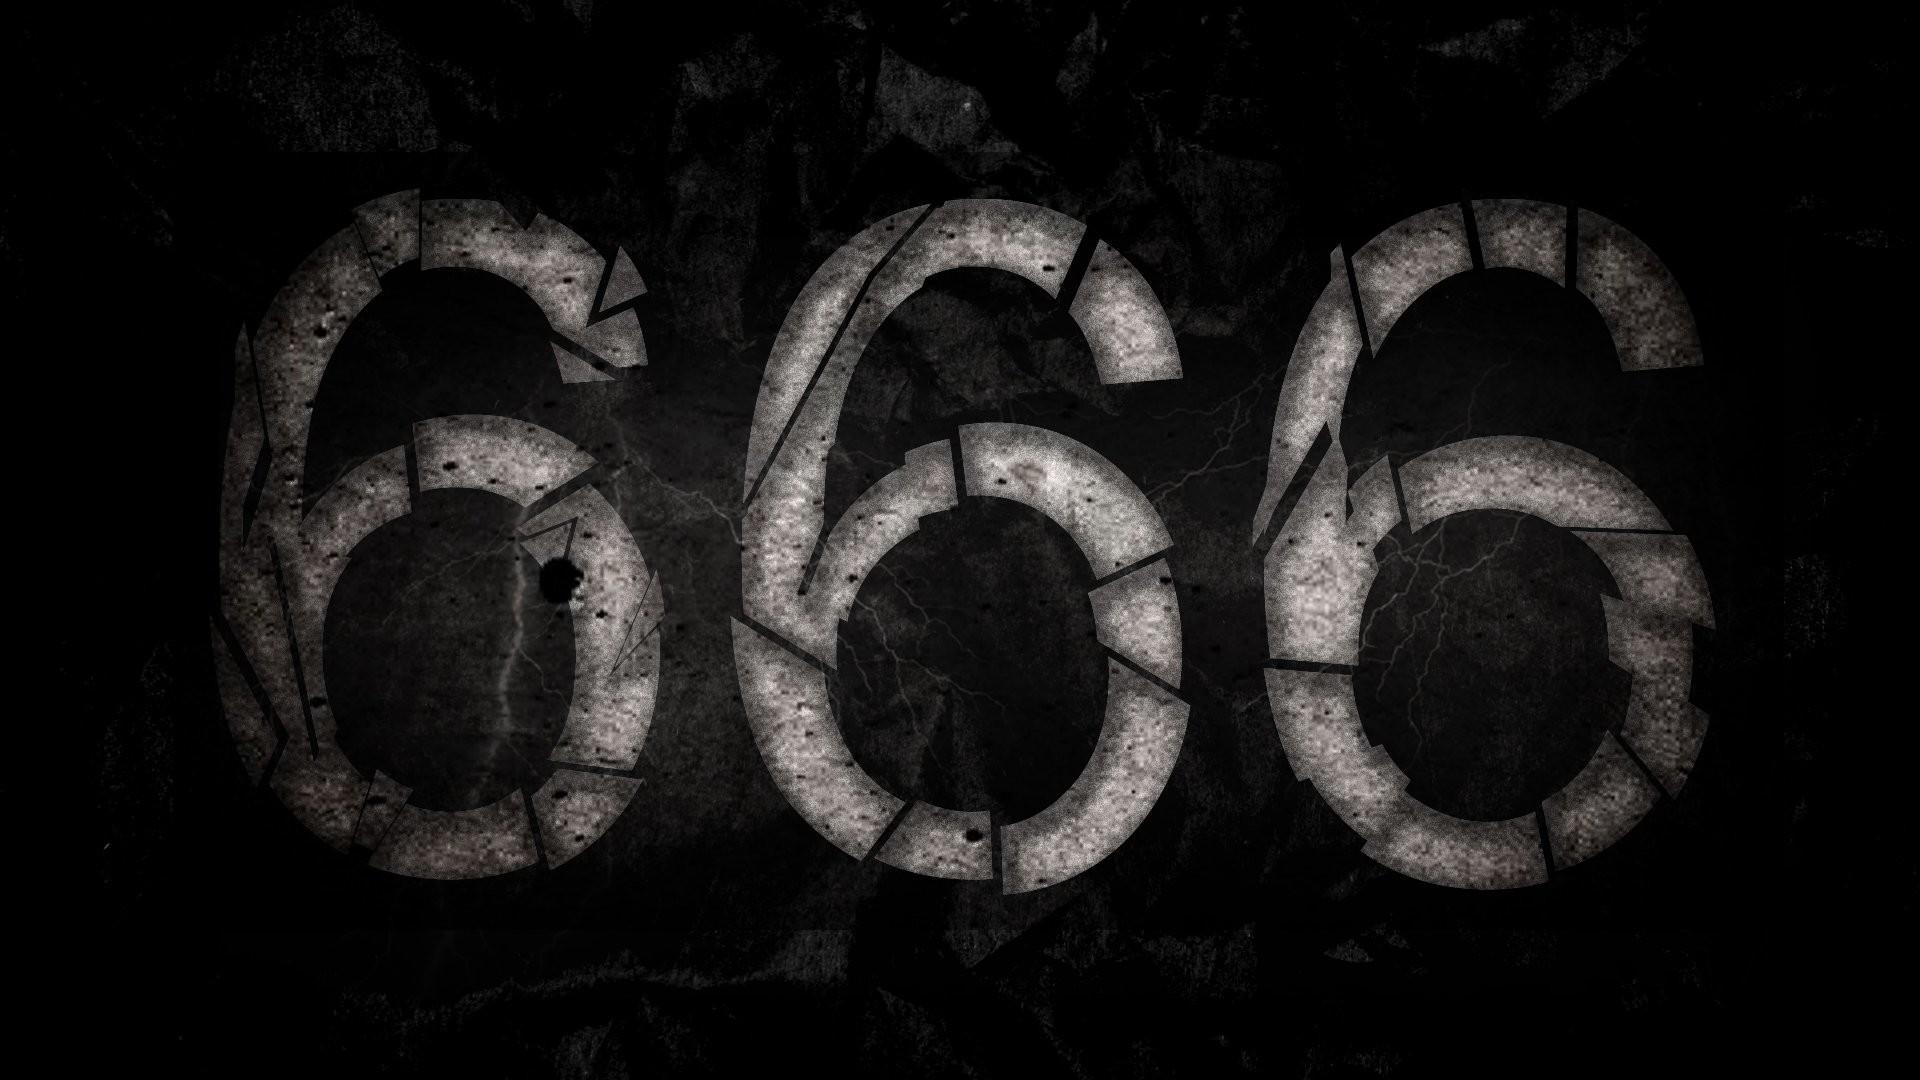 occult satan satanic 666 evil wallpaper